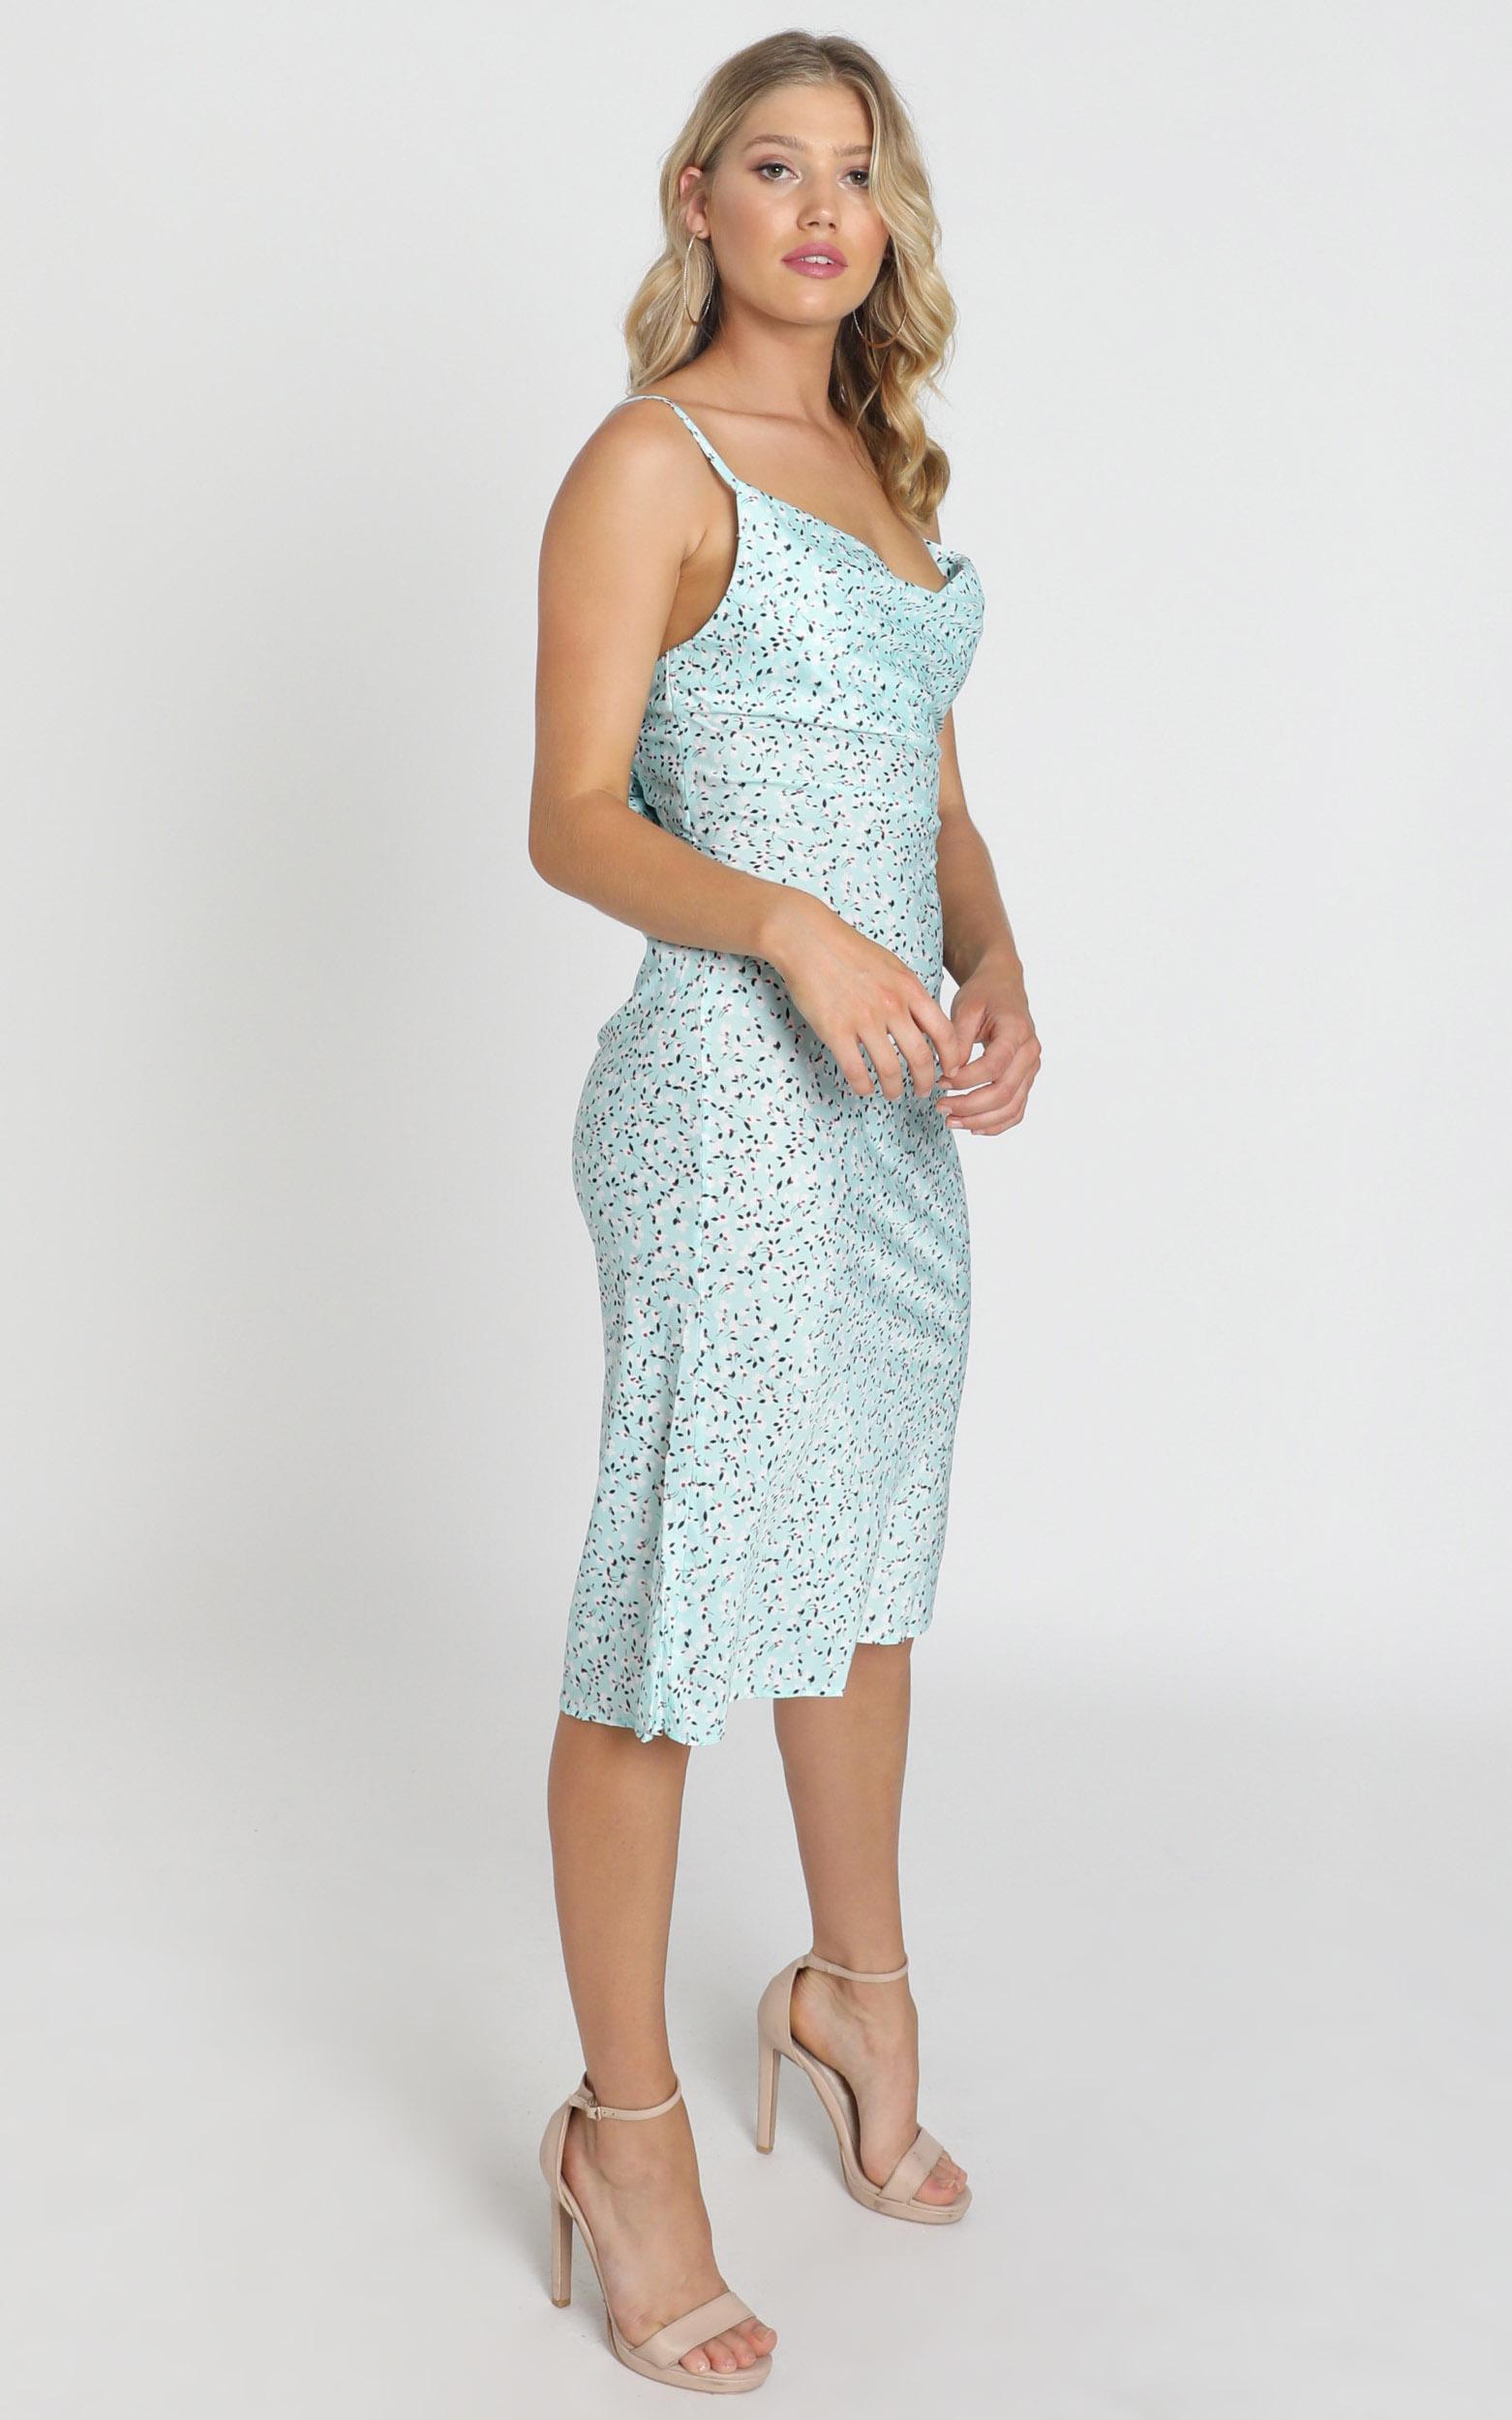 Elki Midi Dress in sage floral - 6 (XS), Sage, hi-res image number null